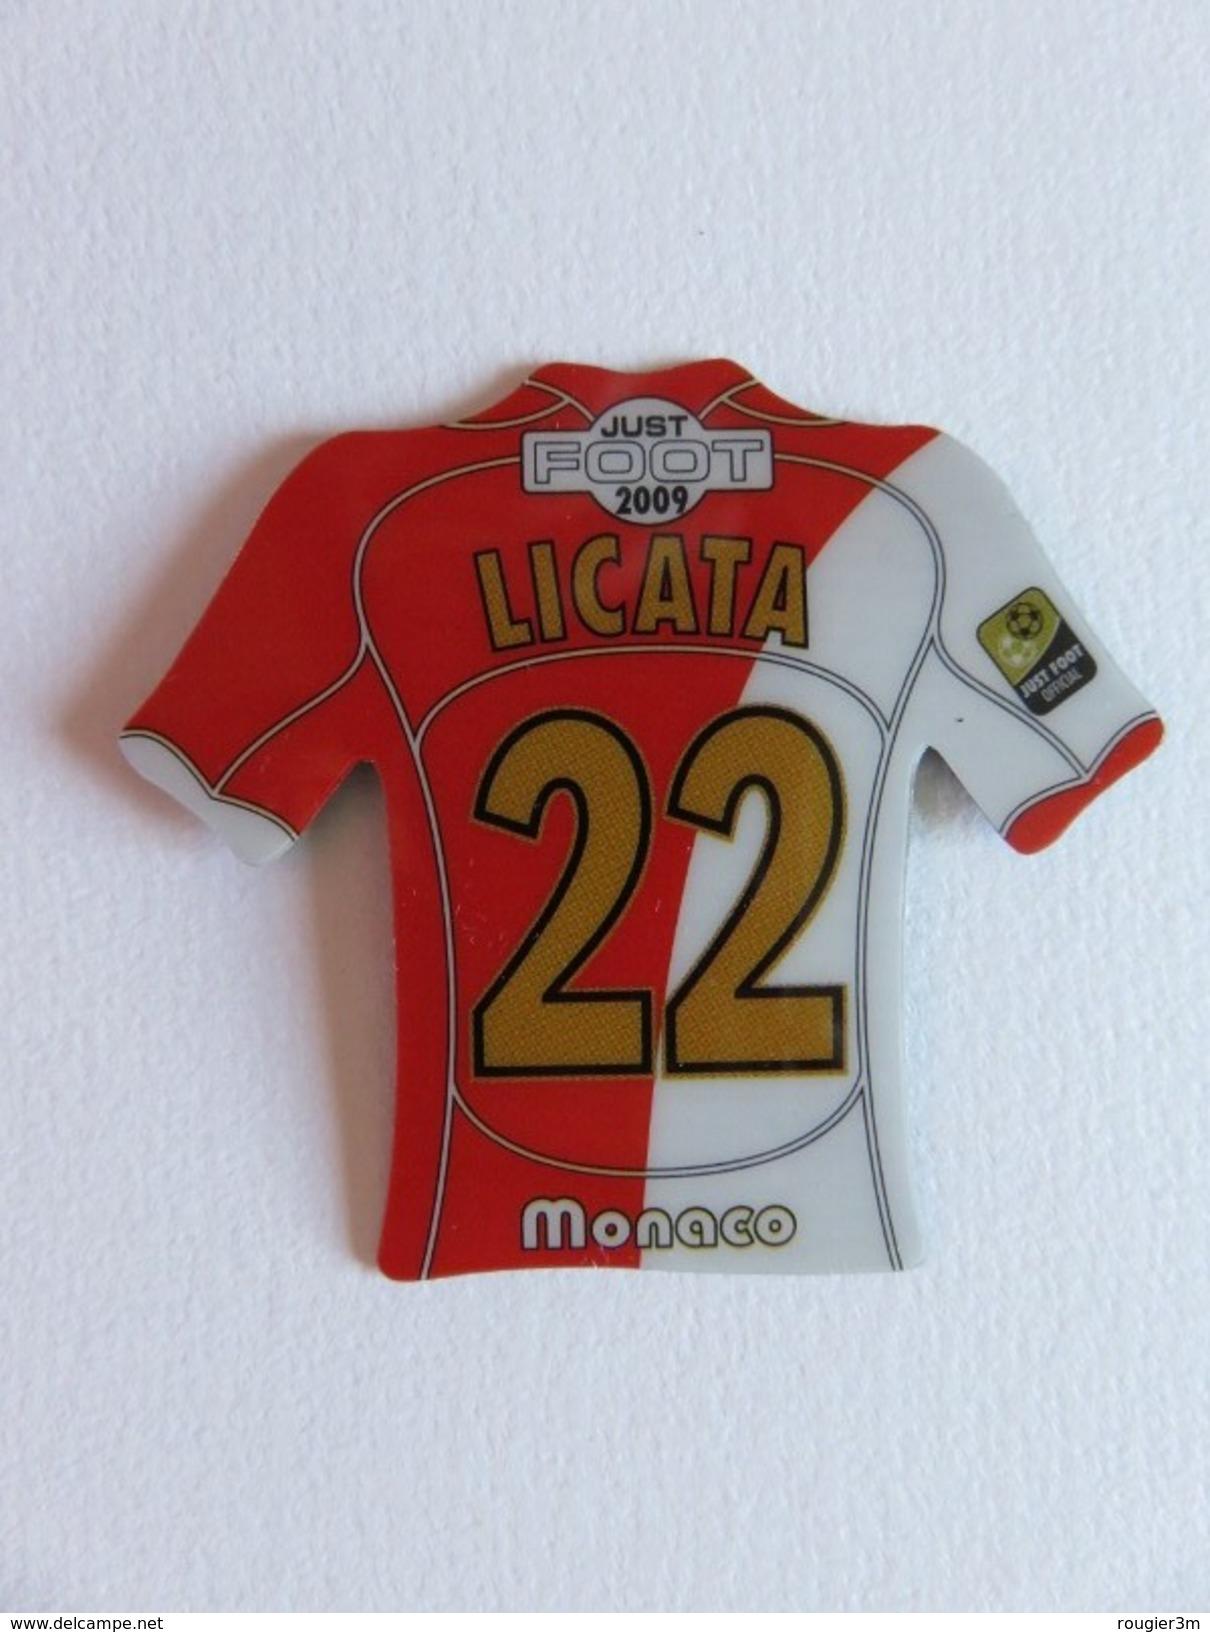 Magnet - Just Foot 2009 - Licata - Maillot N° 22 - Monaco - Sports